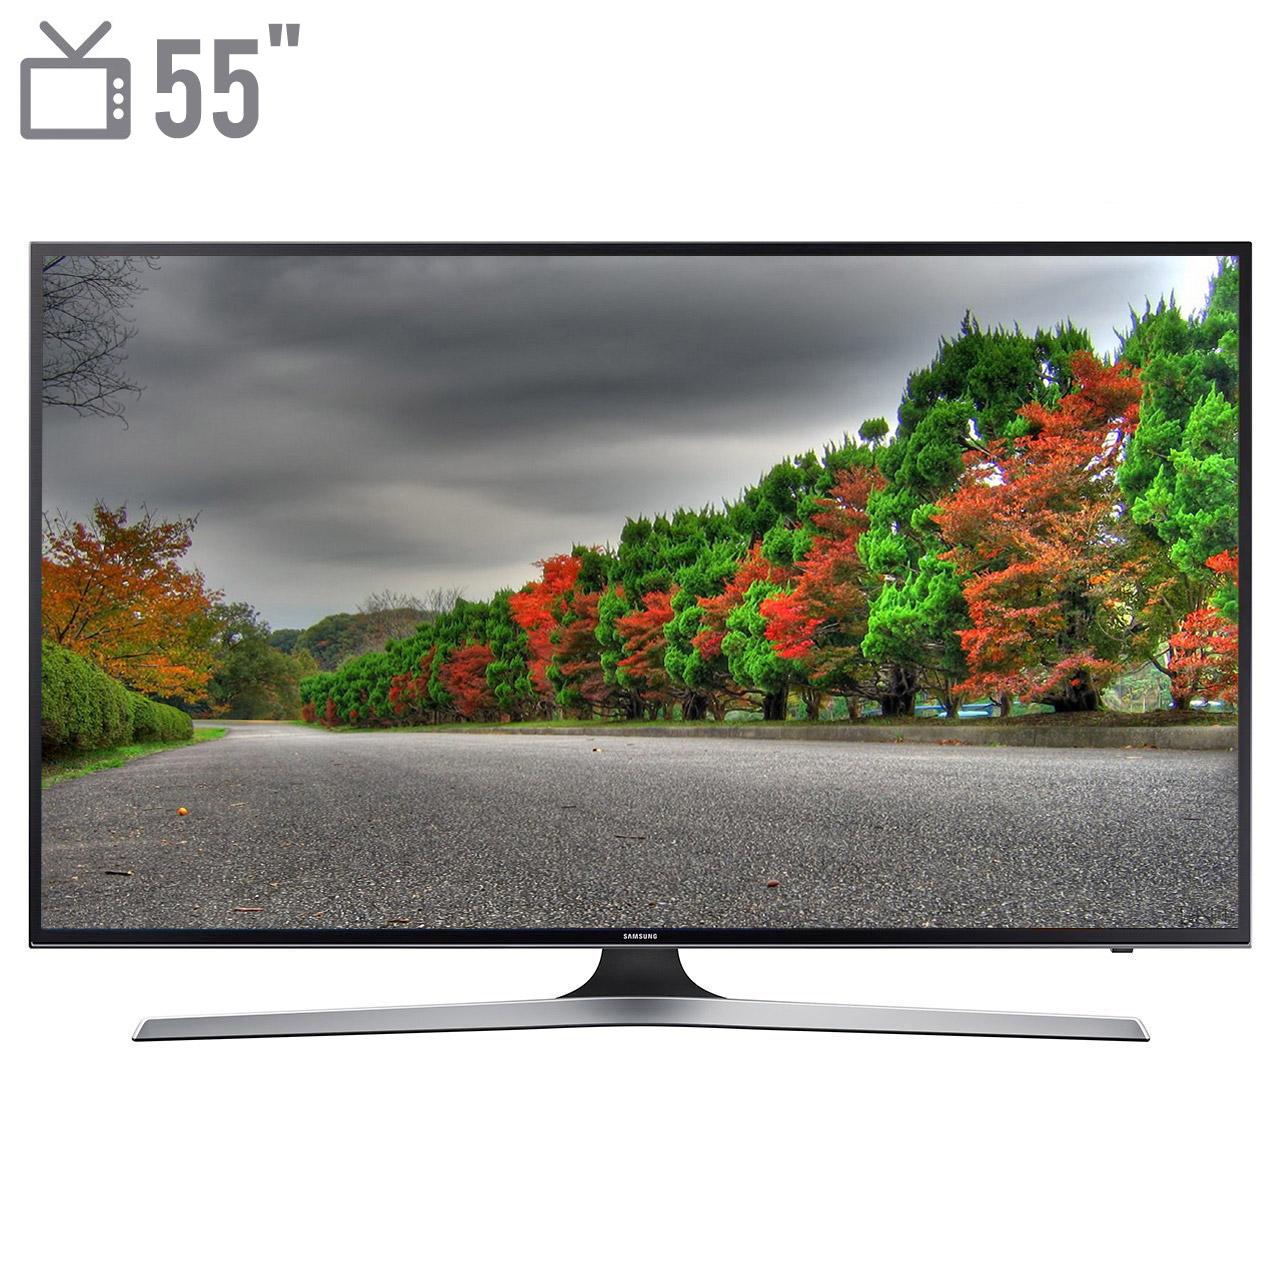 تلویزیون ال ای دی هوشمند سامسونگ مدل 55NU7900 سایز 55 اینچ